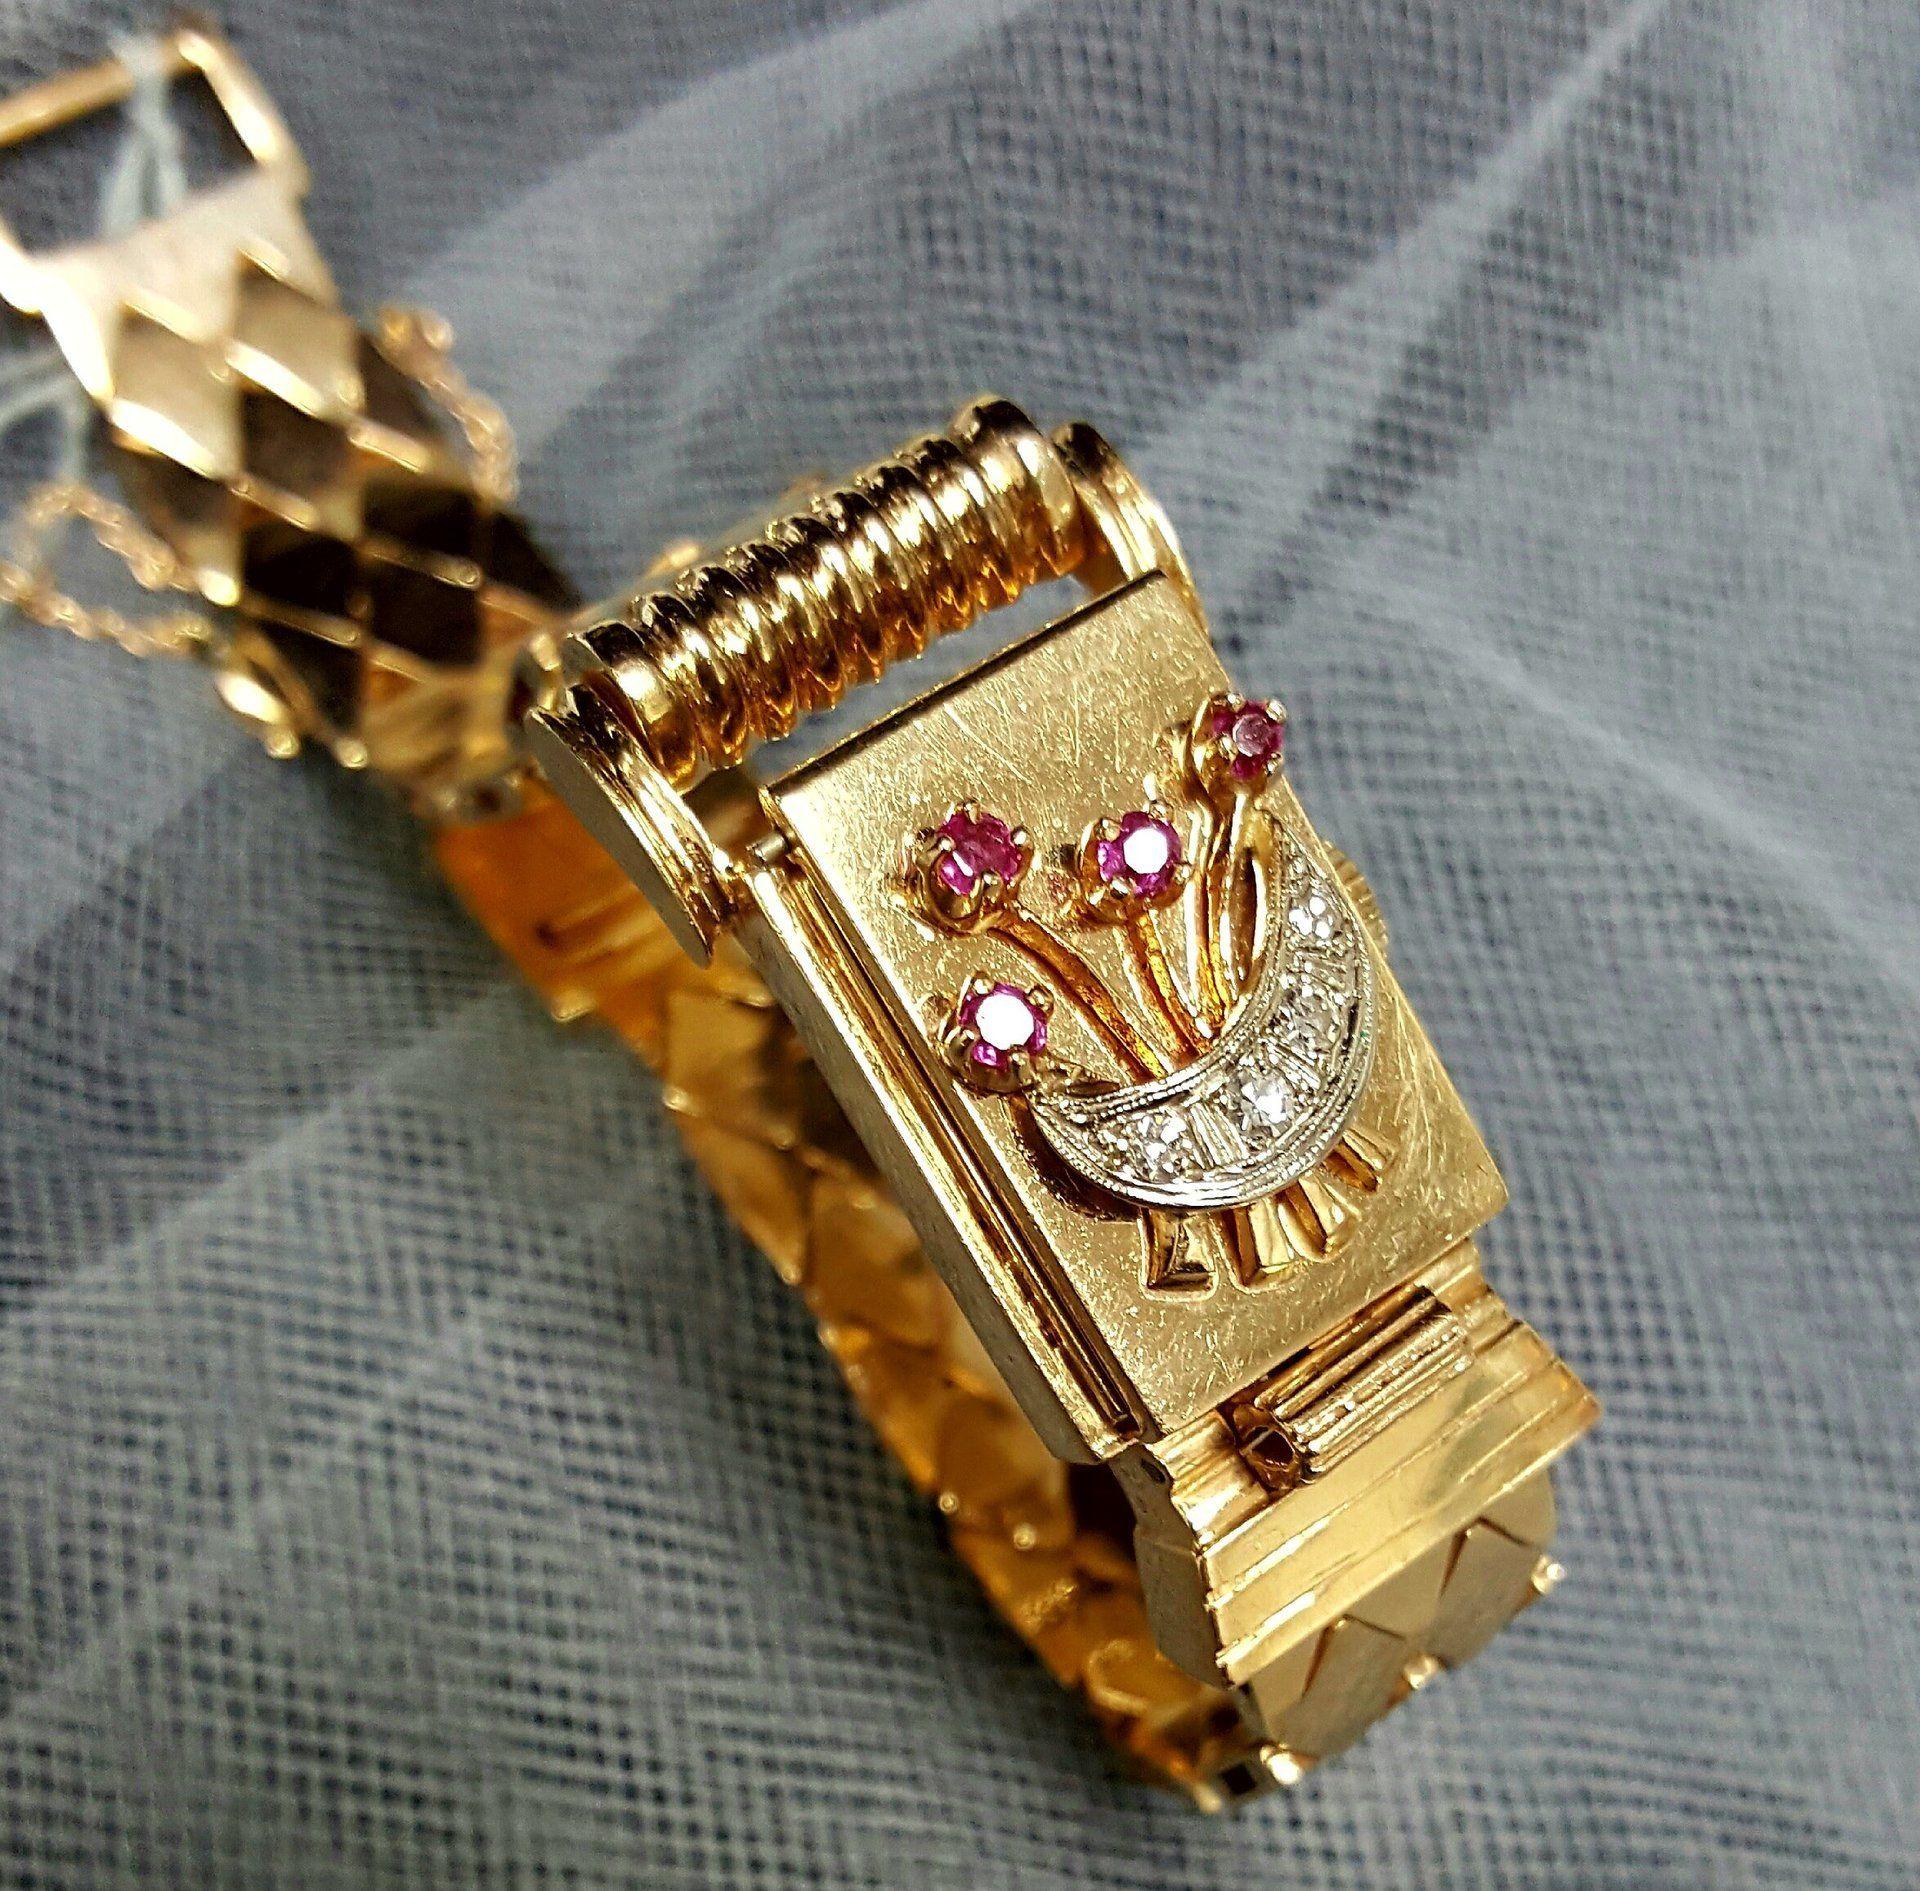 Espling Jewelers - Jacksonville, FL - About Us